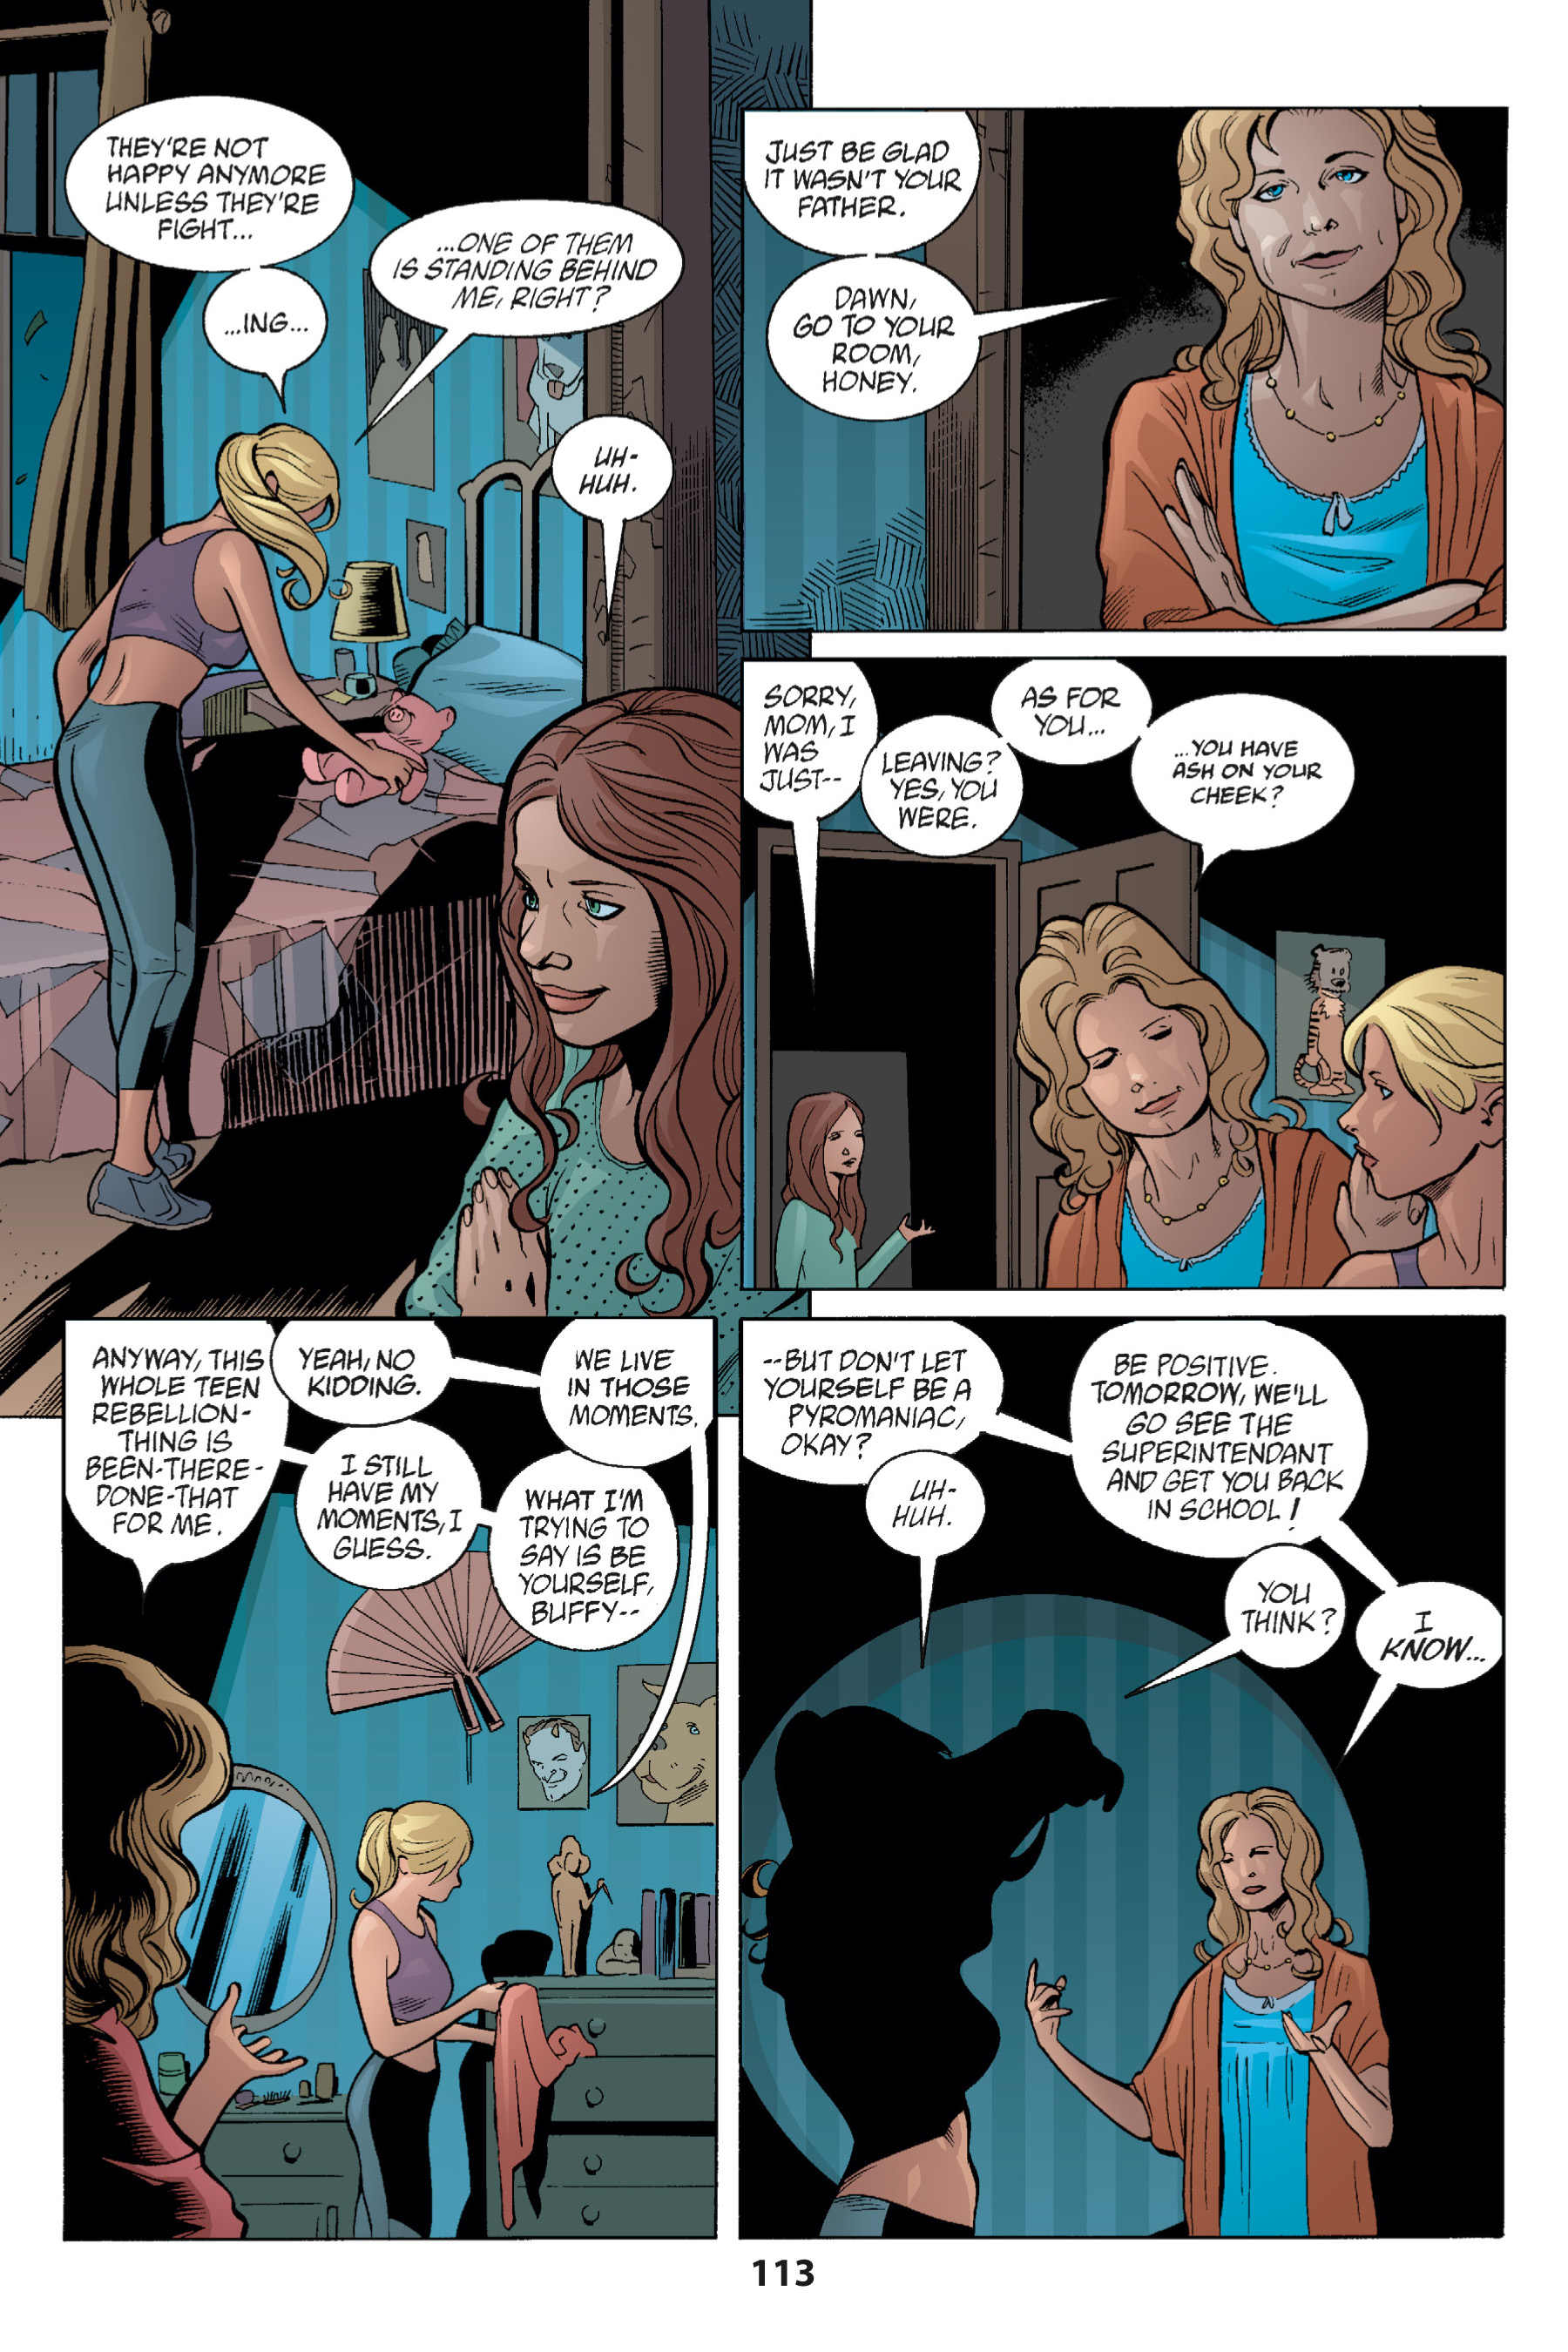 Read online Buffy the Vampire Slayer: Omnibus comic -  Issue # TPB 1 - 112